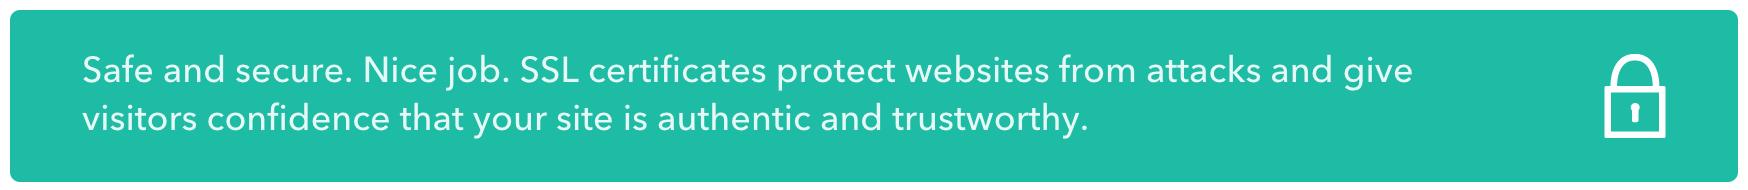 ssl certificate approved